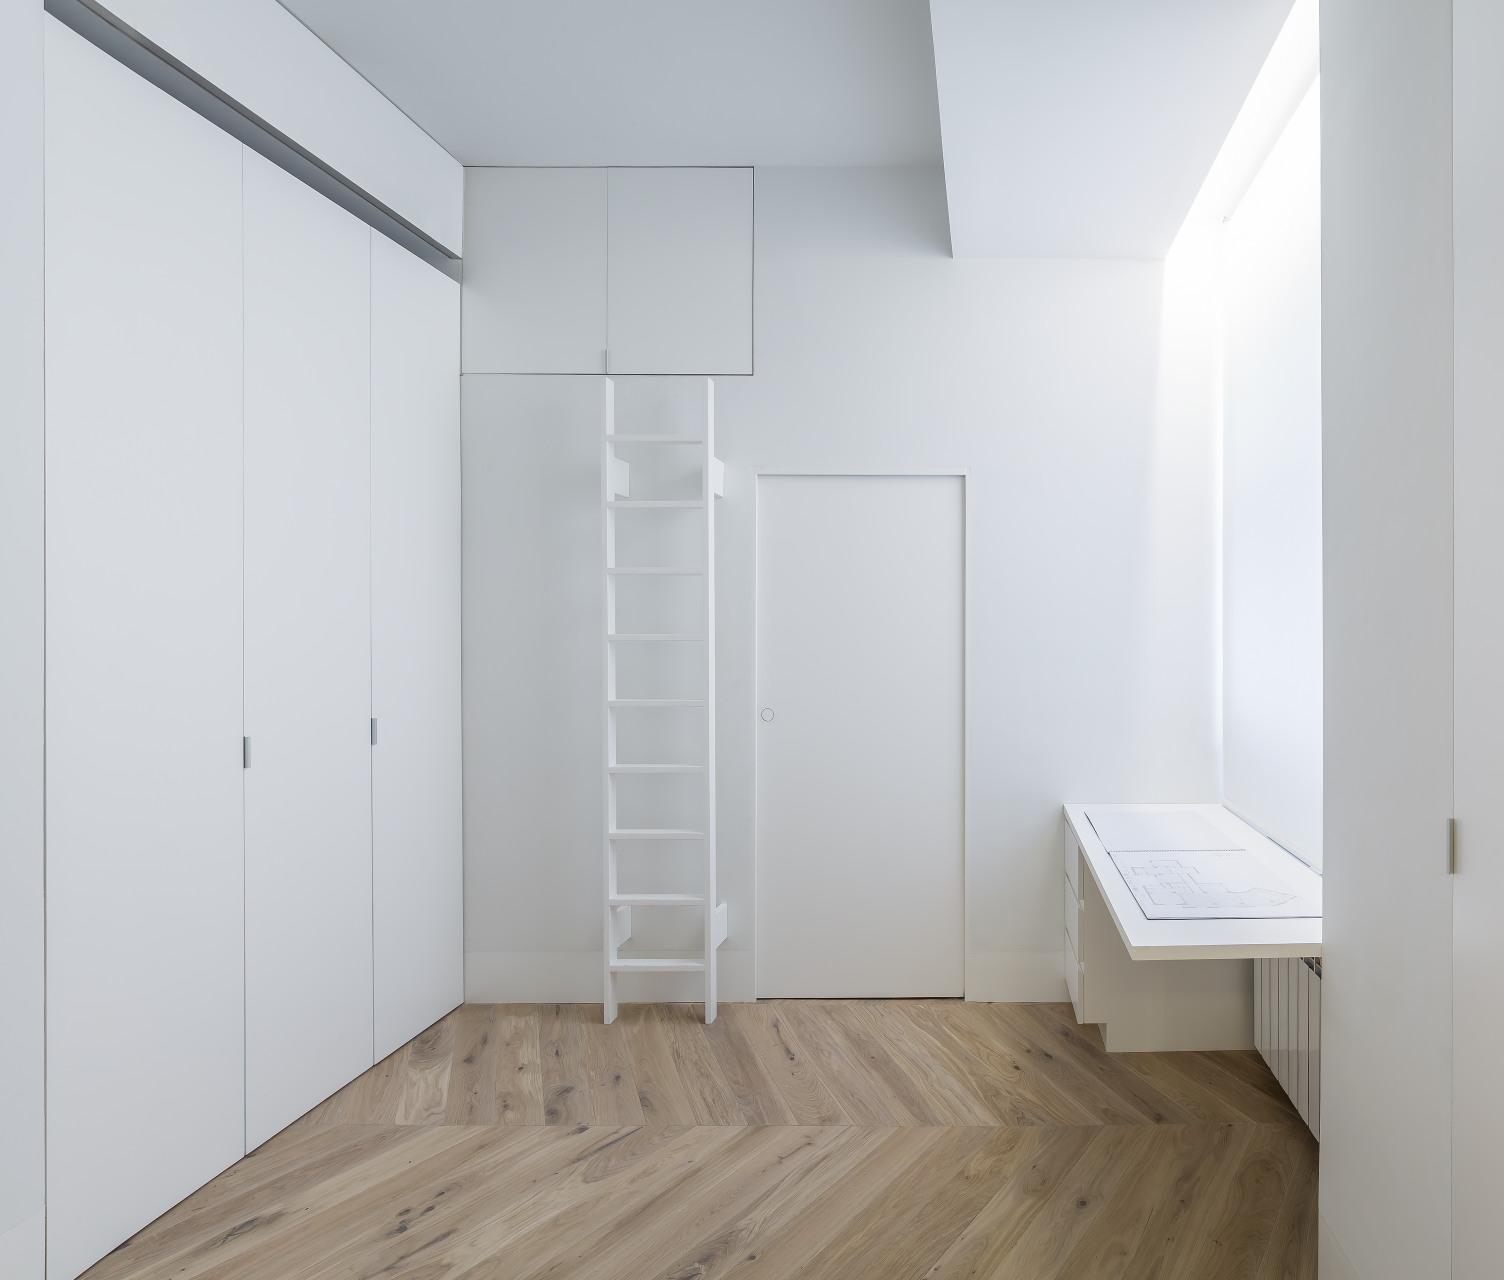 fotografia-arquitectura-valencia-german-cabo-gallardo-llopis-bfm-edificatoria-turia01 (7)